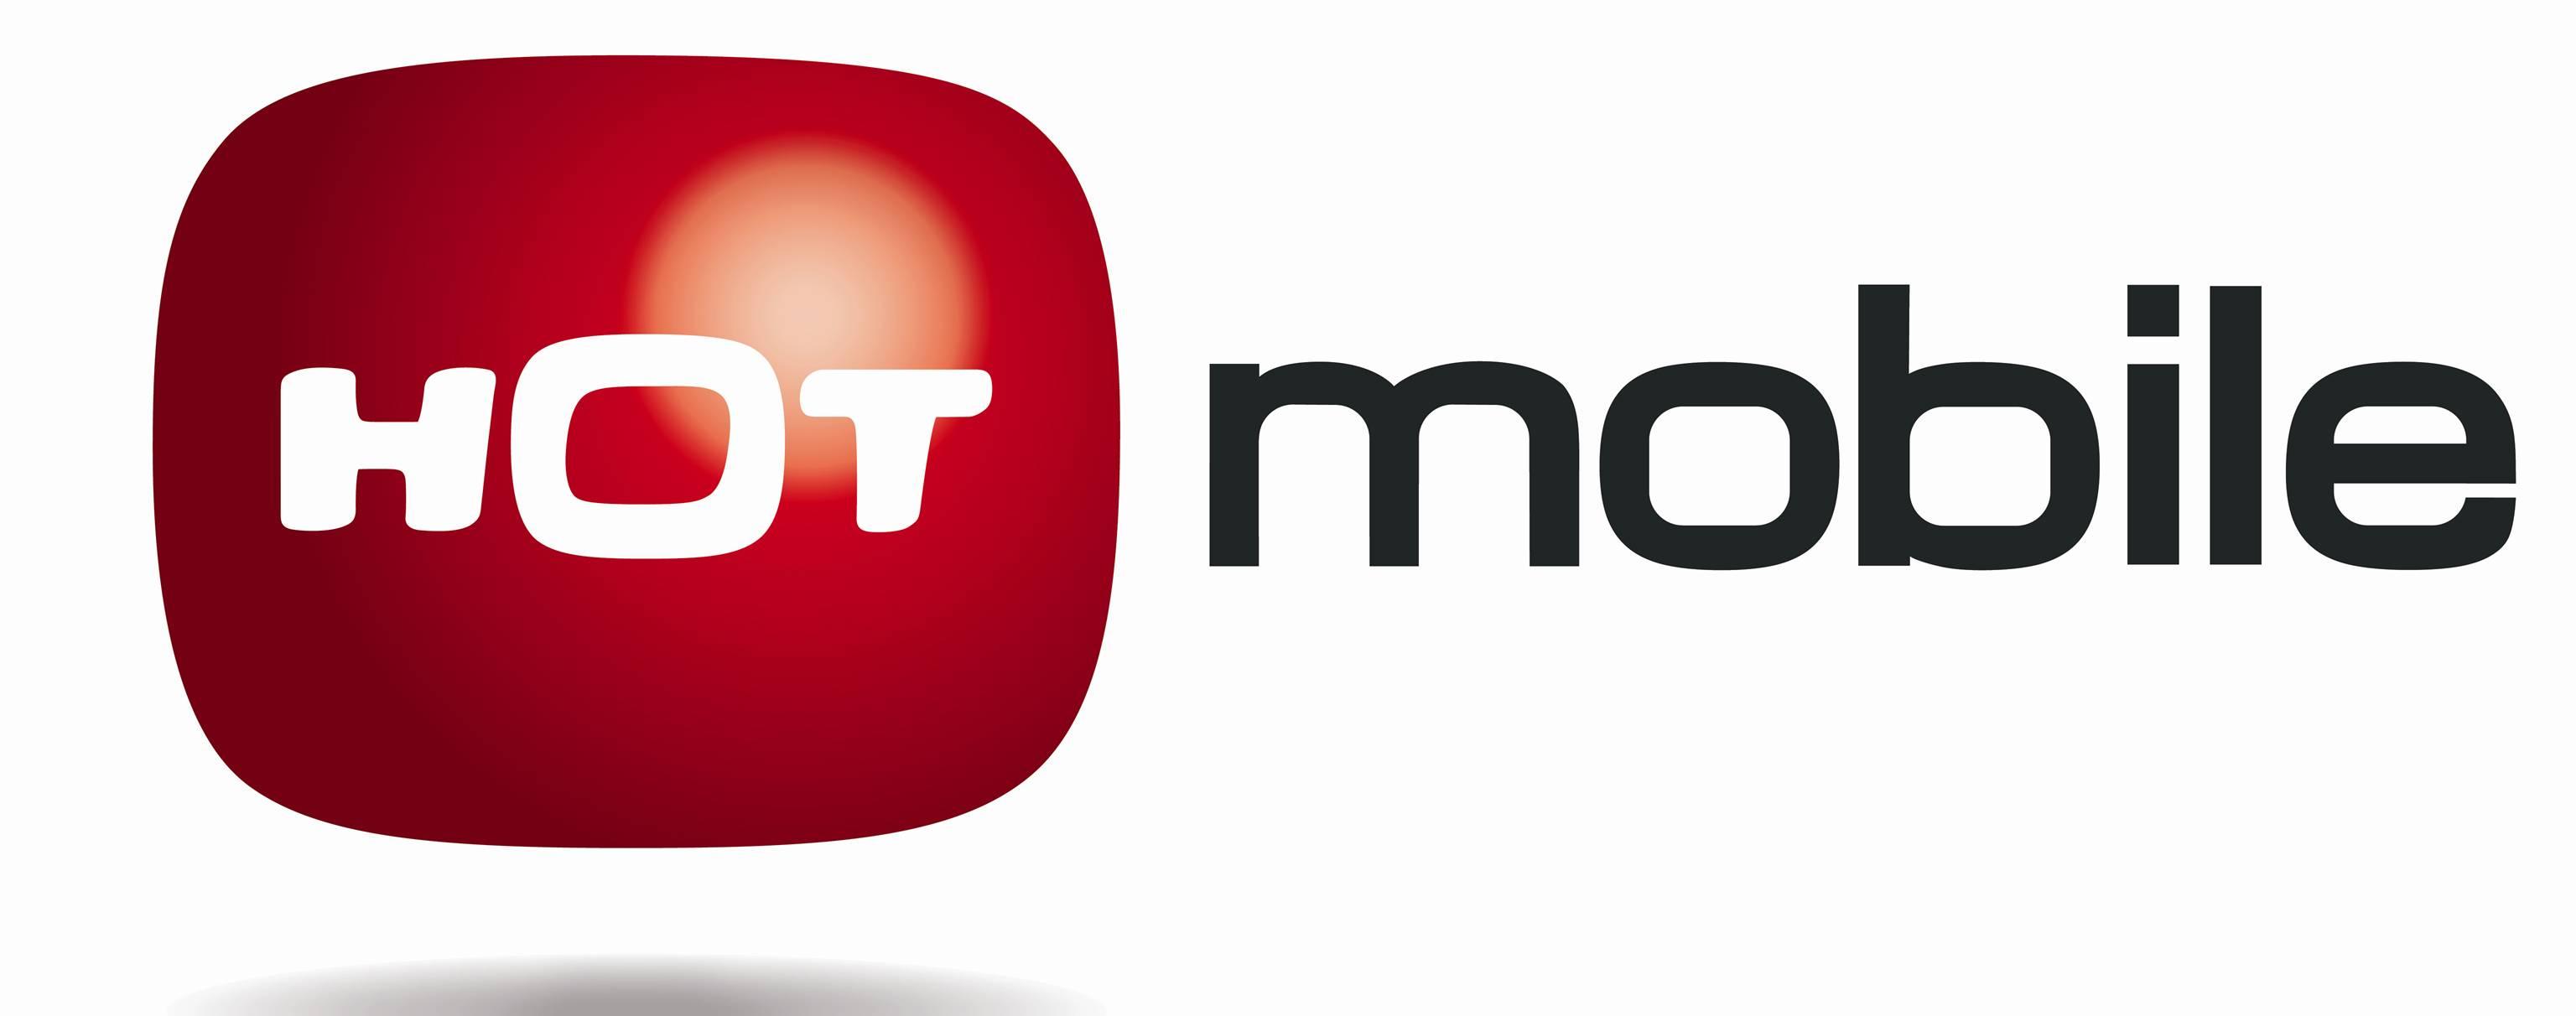 HOT Mobile оставила конкурентов далеко позади